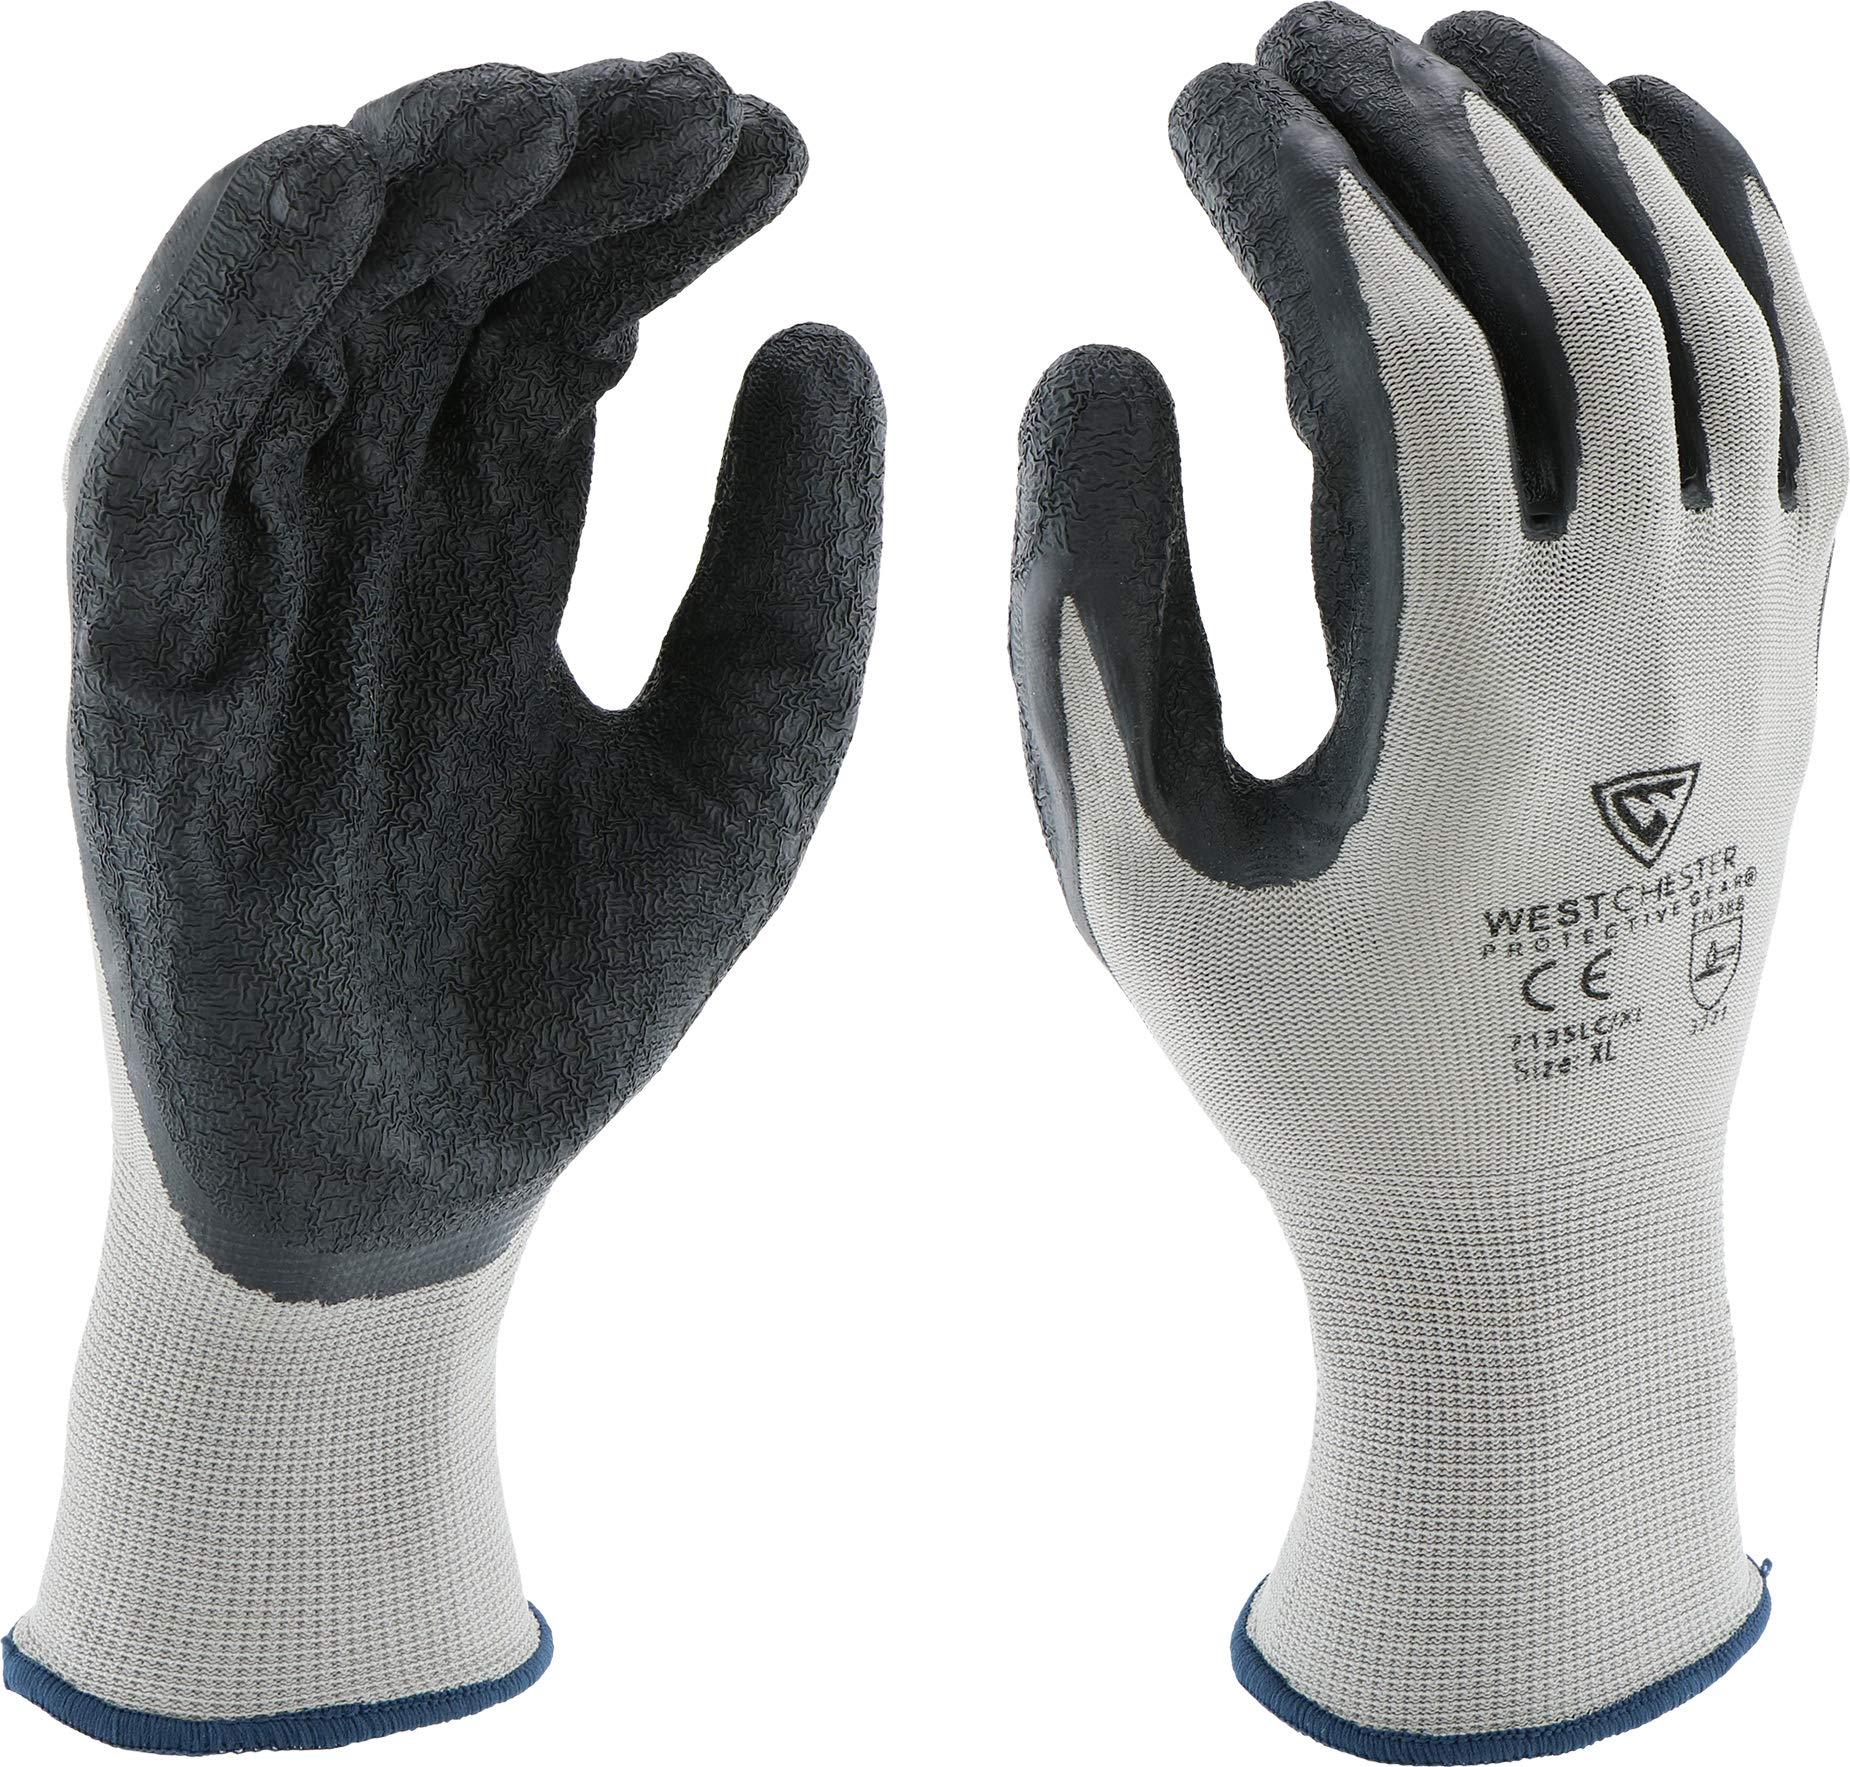 West Chester 713SLC M Latex Coated Multipurpose Work Glove, Medium, Black Gray (Pack of 12)